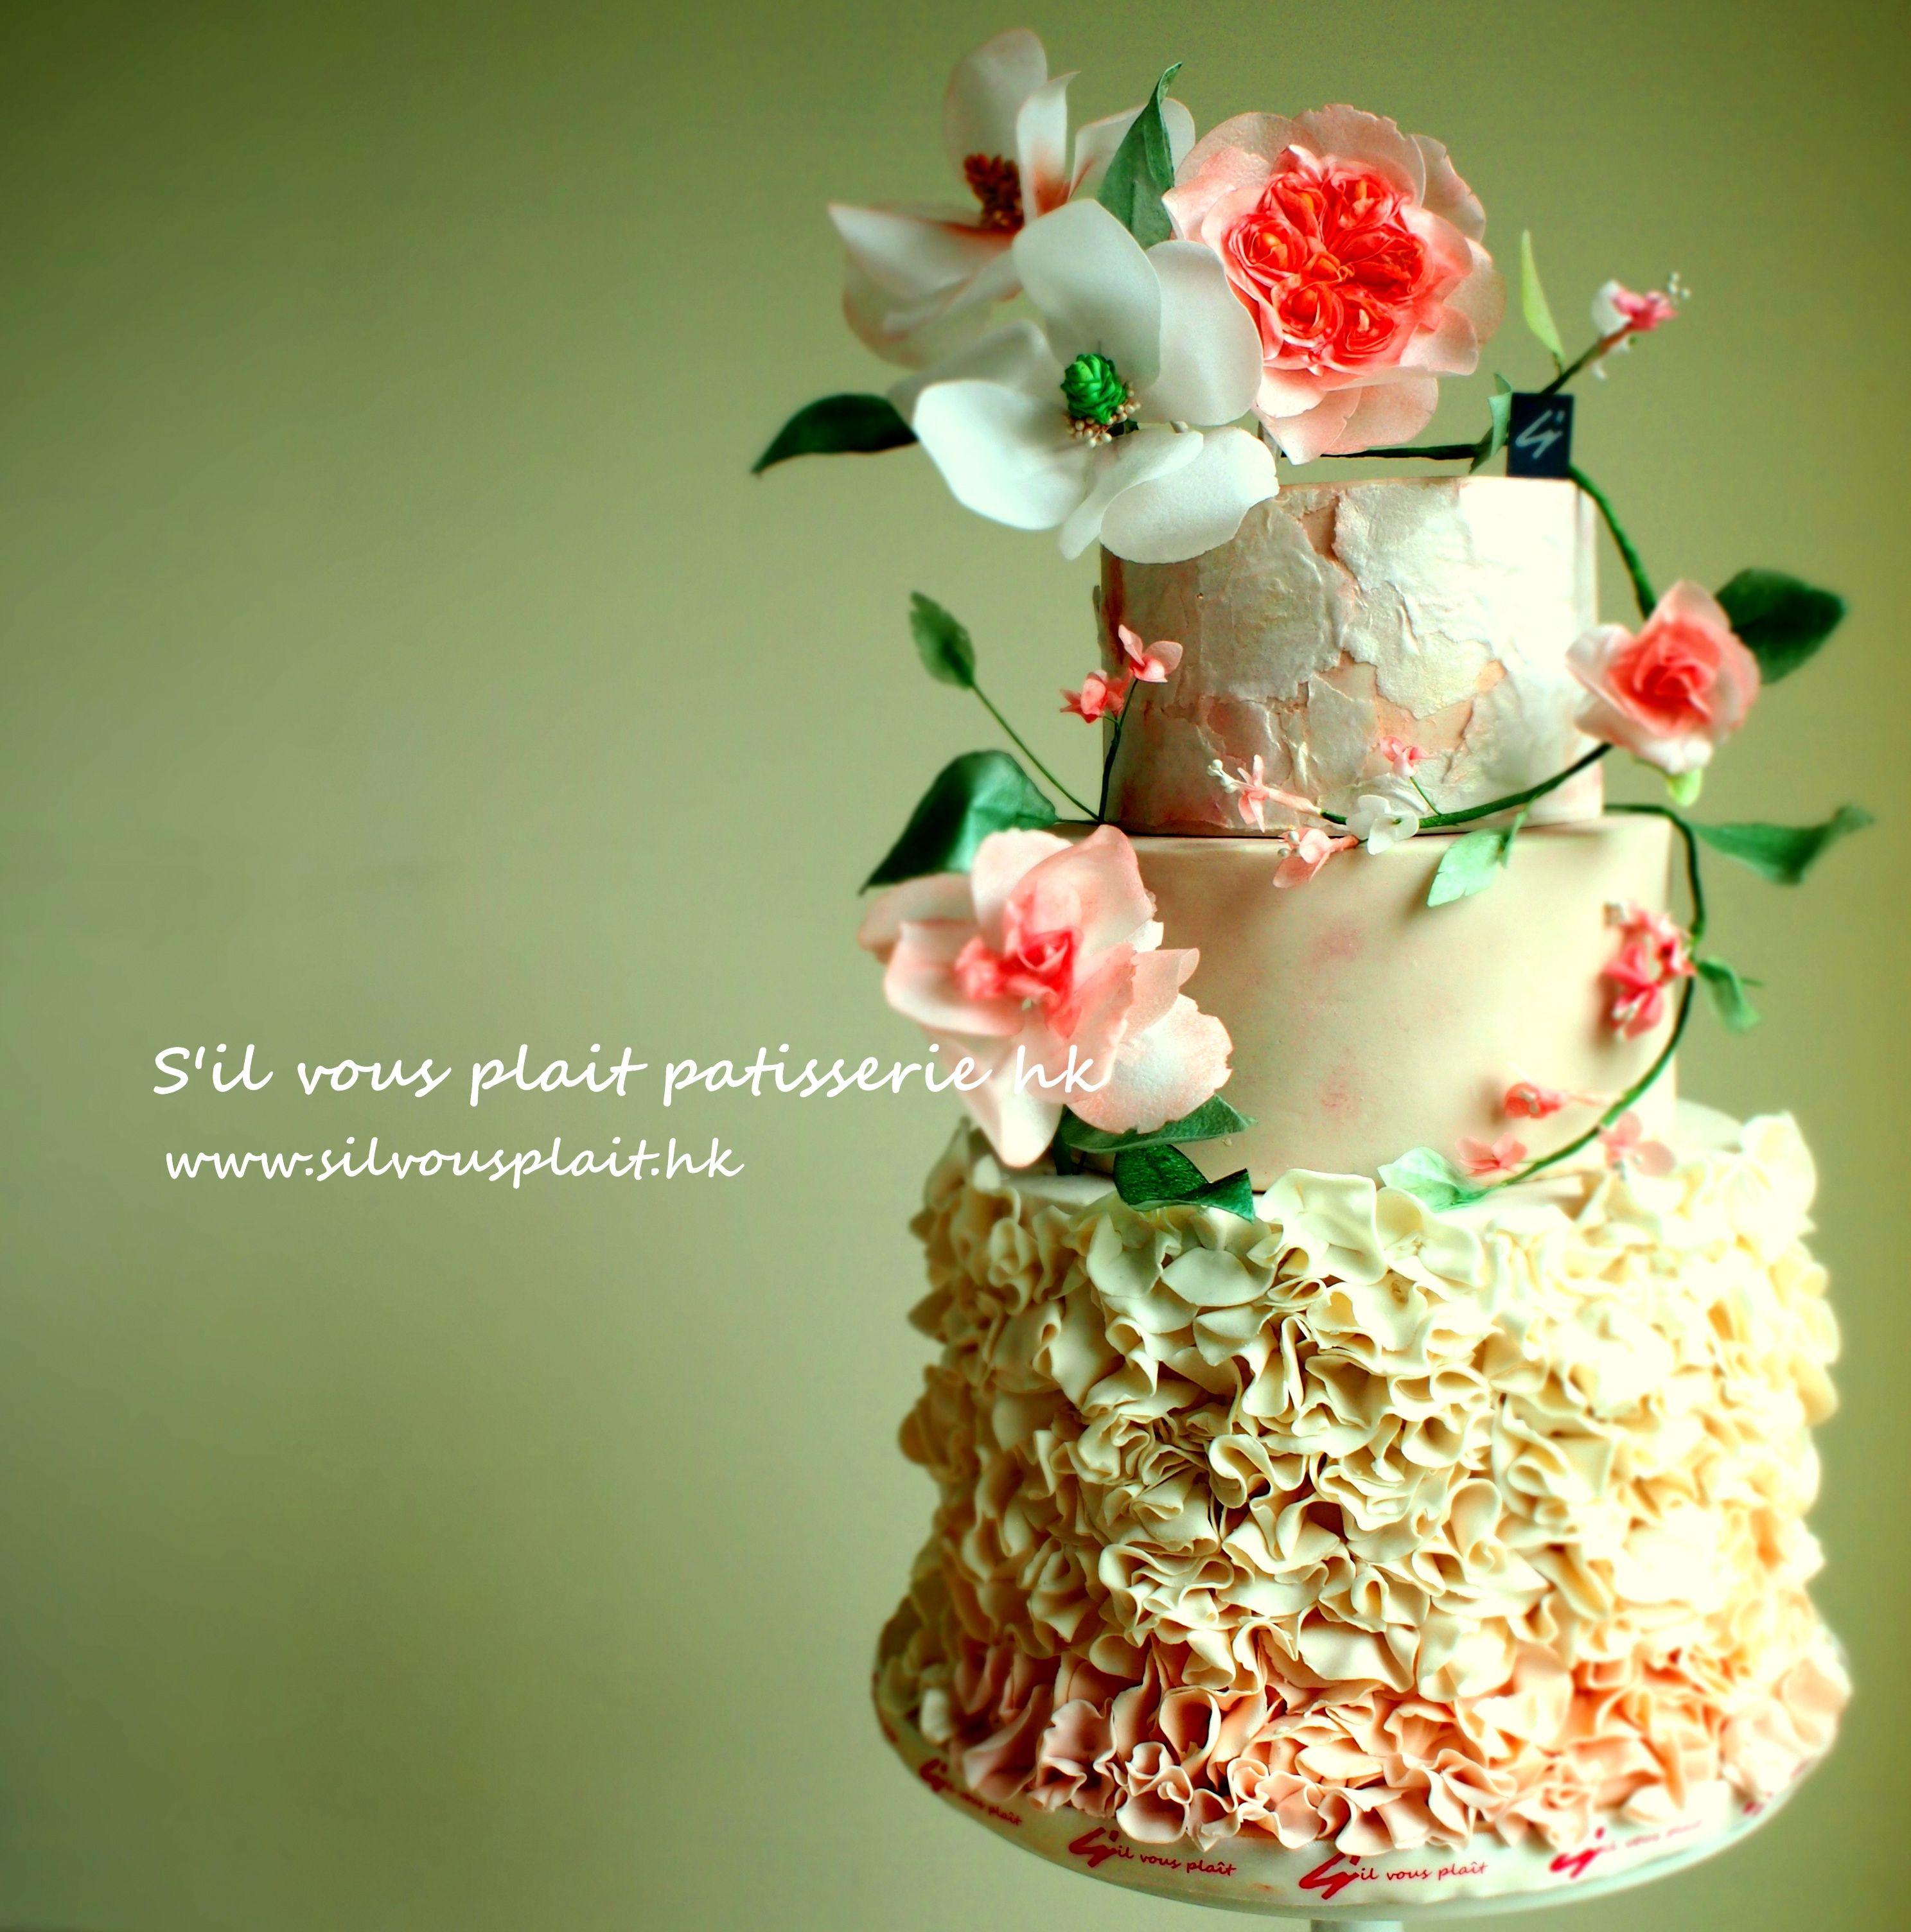 Weddingcake Birthdaycake Garden Flower Alloccasioncake Elegance Cake Sophisticated Anniversarycake Wedding Wedding Cakes Anniversary Cake Cake Design